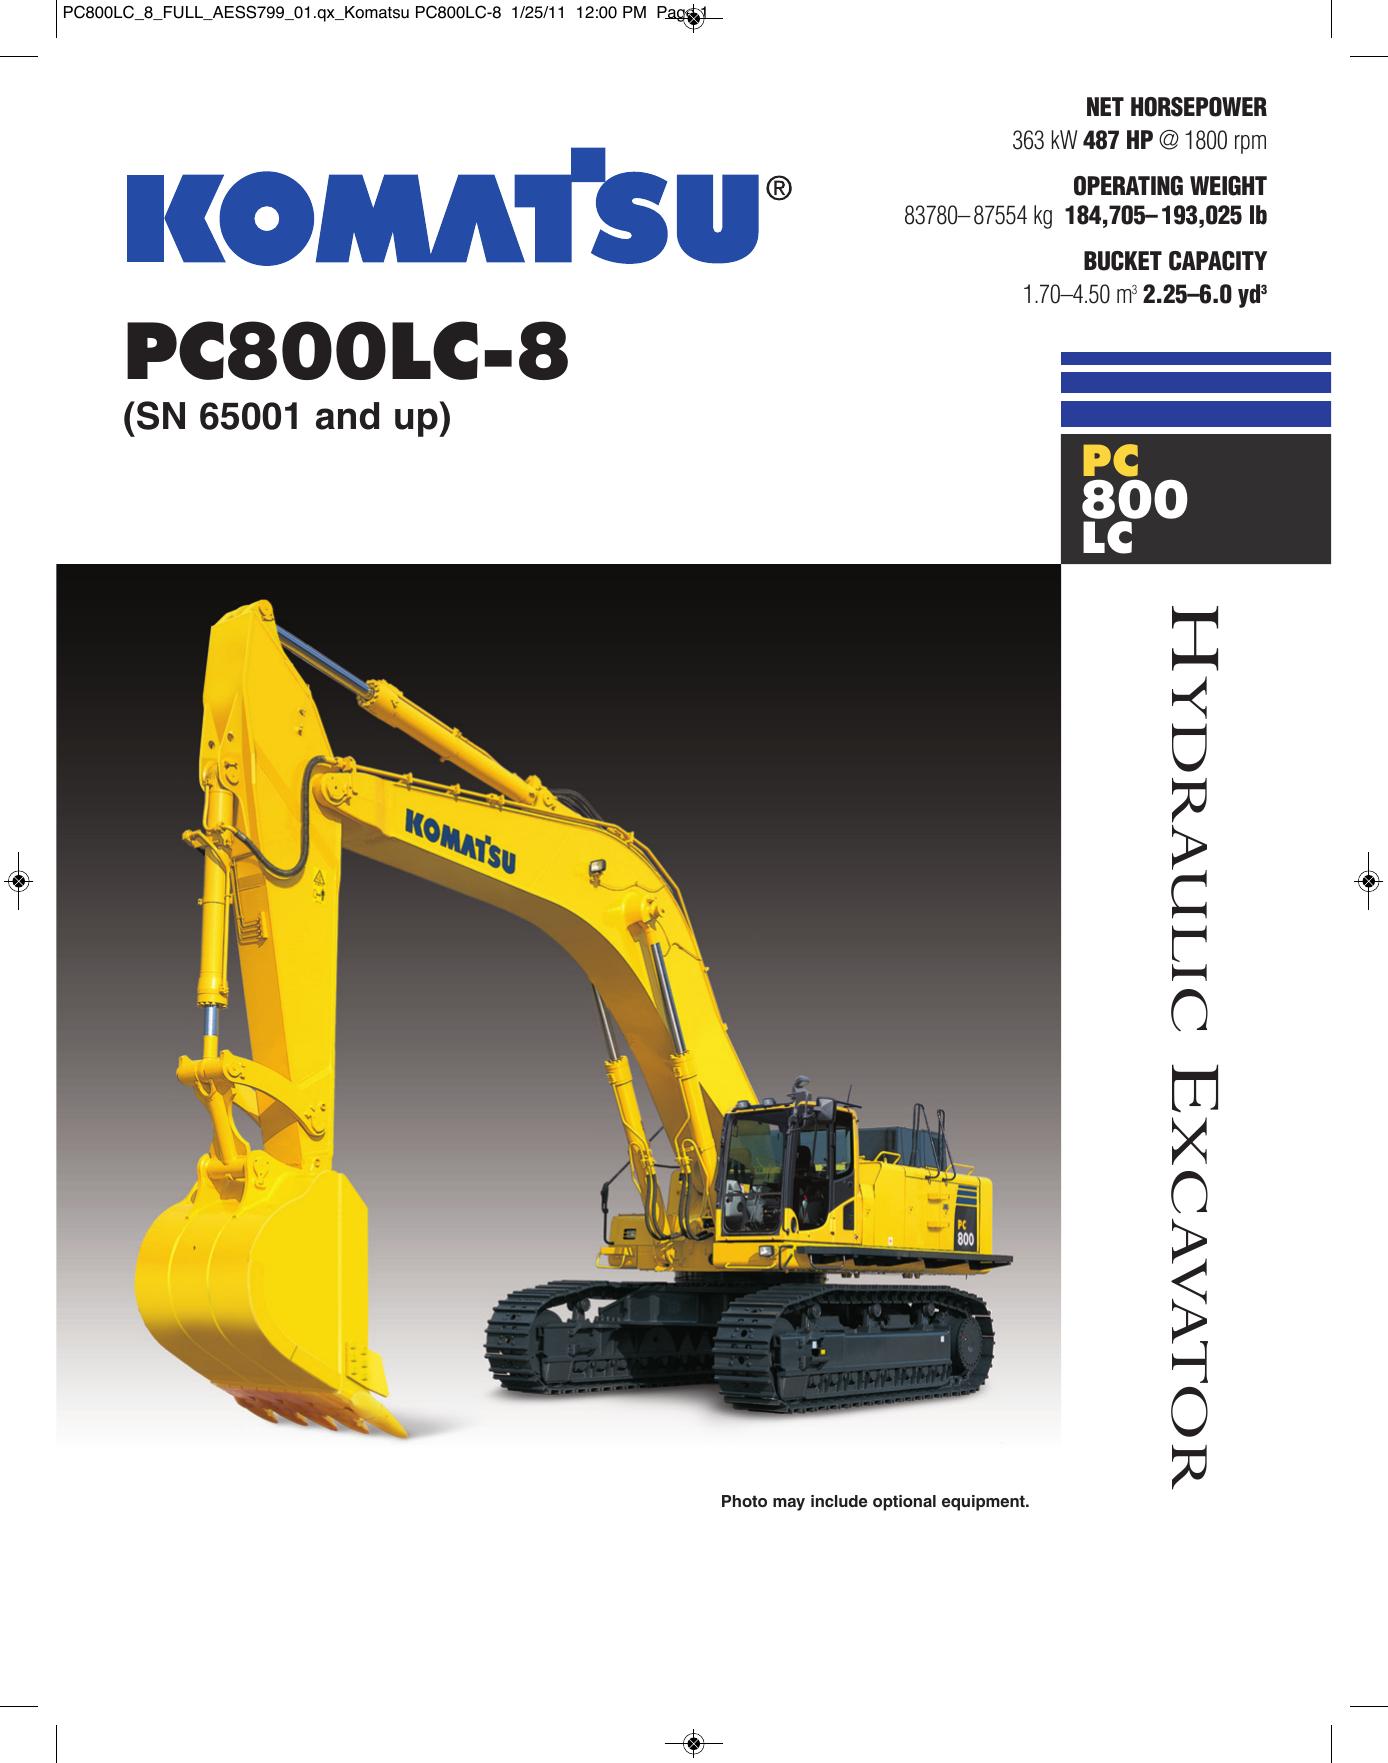 Komatsu Pc800 8 Manual Collection Inncom E528 Wiring Diagram Room 2016 Pc45mr 5 Array Rh Zettadata S